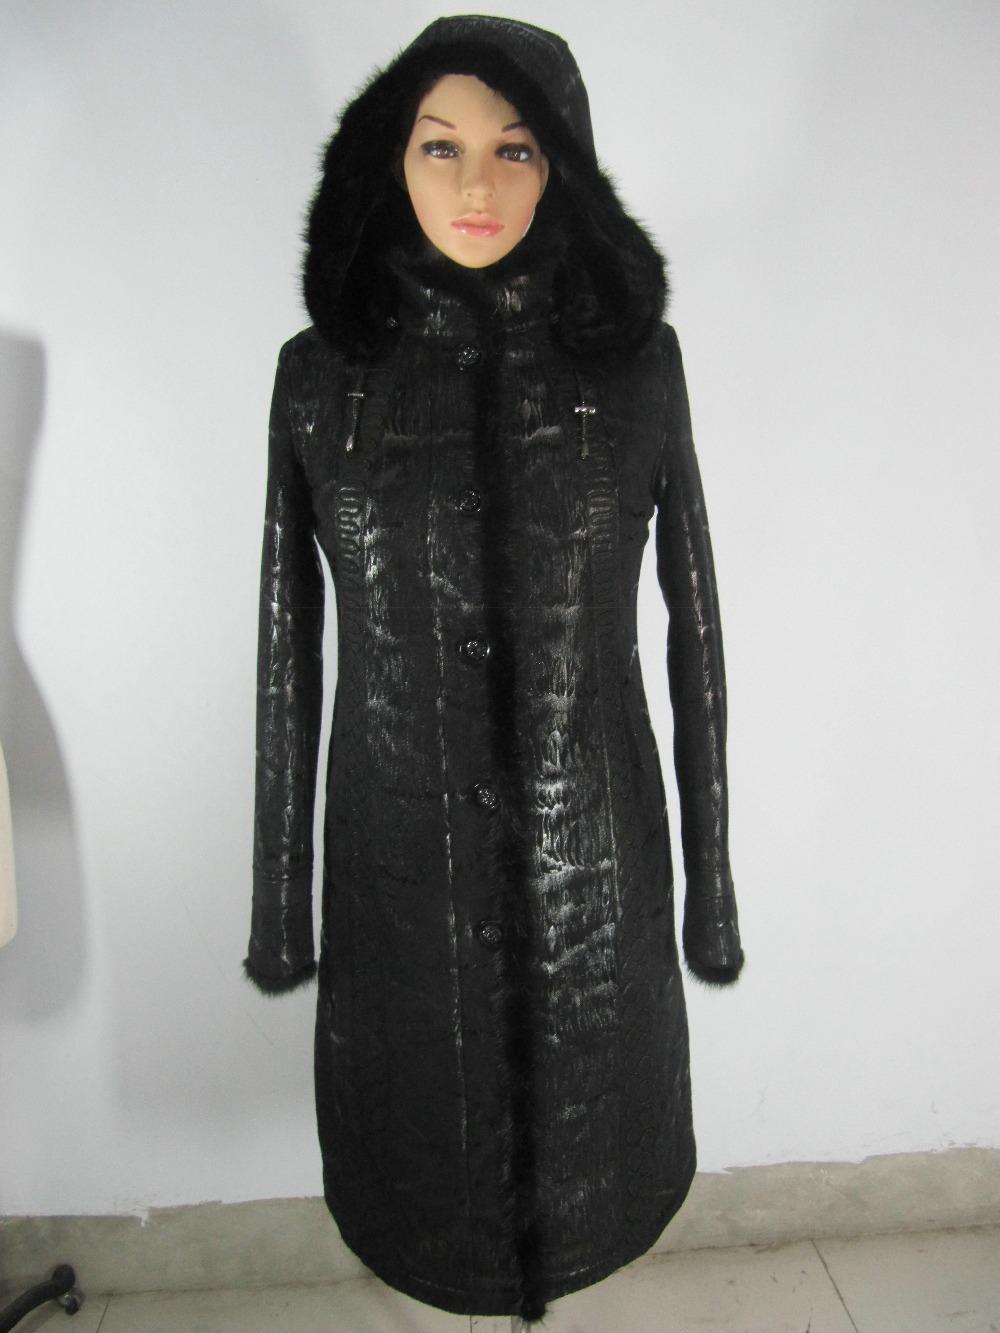 fur coats detachable cap2014 new autumn and winter women's fur coat jacket plus fertilizer really mink collar paragraph shipping(China (Mainland))